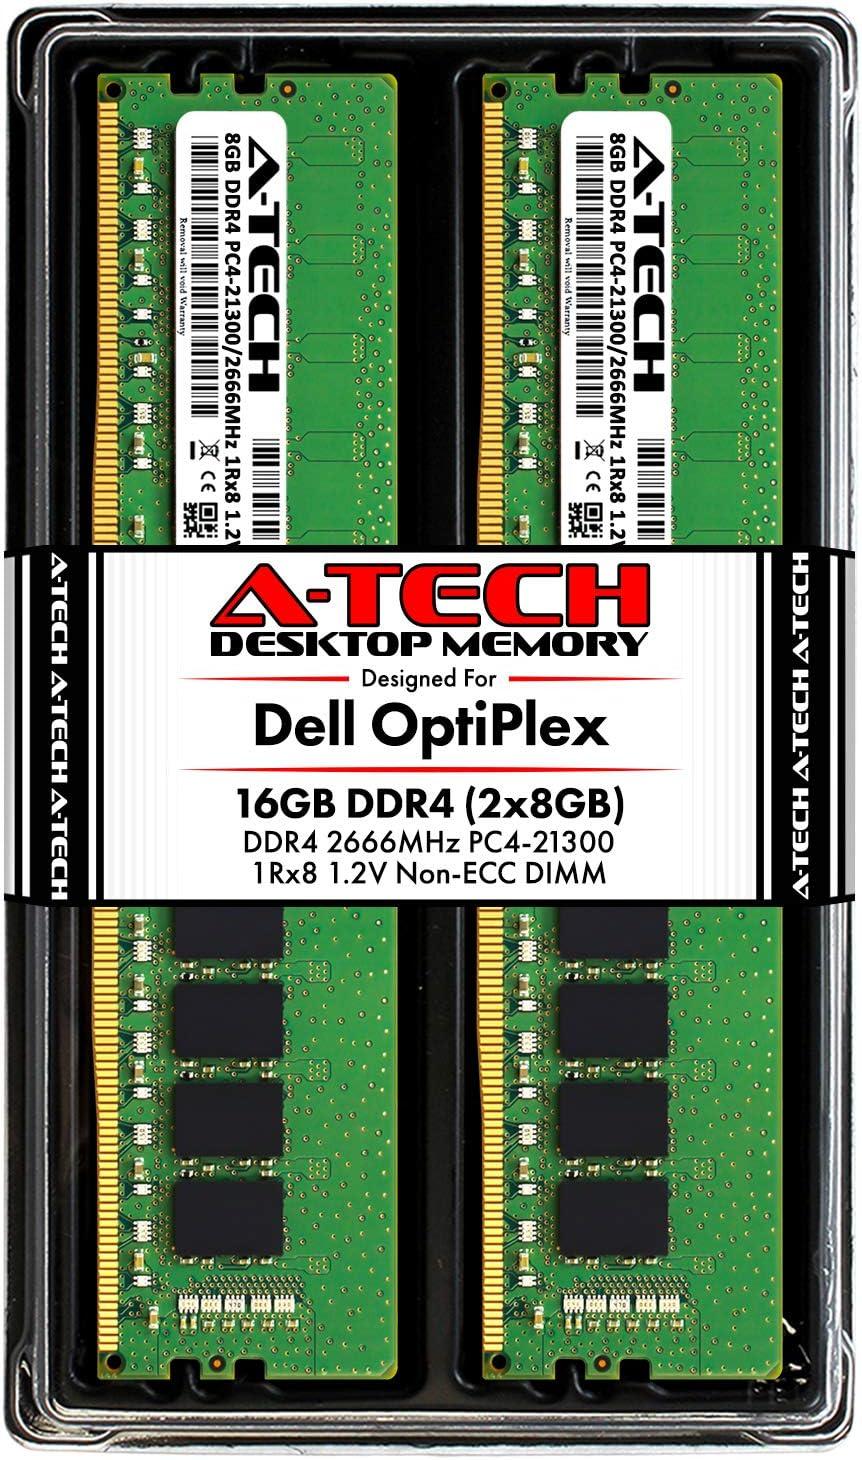 A-Tech 16GB RAM Kit for Dell OptiPlex XE3, 7070, 7060, 5070, 5060, 3070, 3060, Tower/SFF - (2 x 8GB) DDR4 2666MHz PC4-21300 Non-ECC DIMM Desktop Memory Upgrade